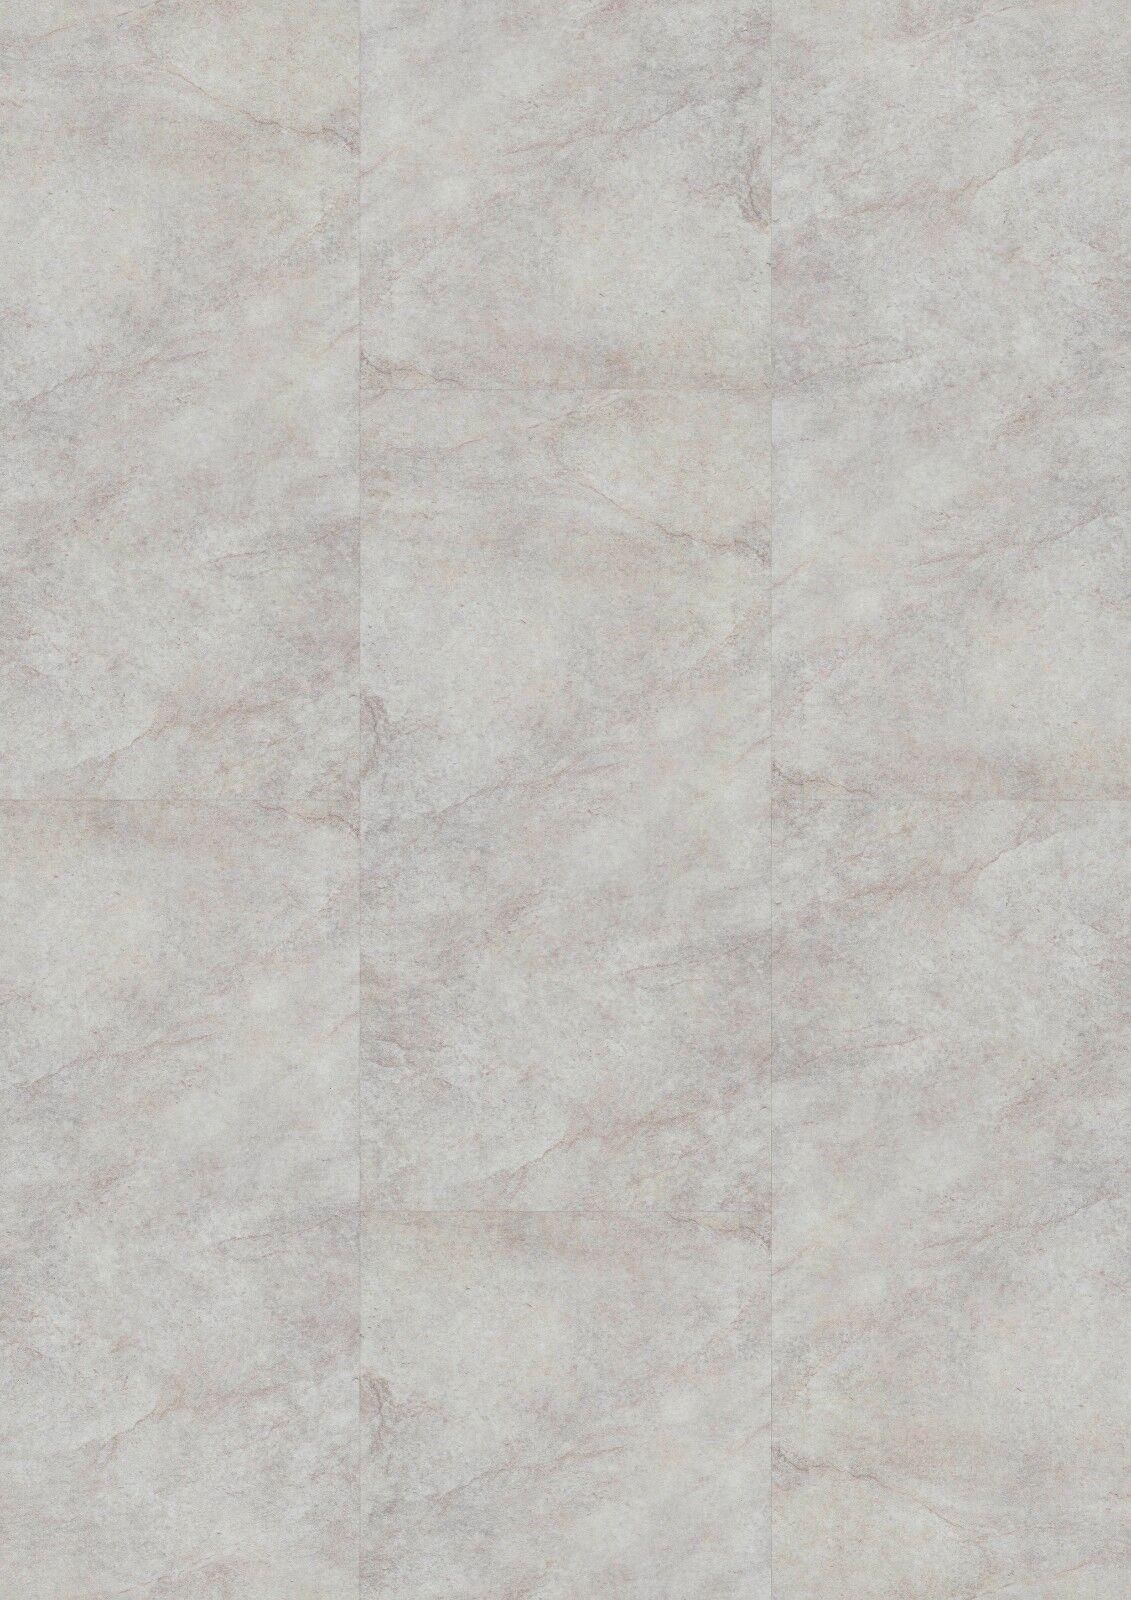 JOKA / INKU Design 2867 Vinylboden / Designboden (Light Washed Stone)